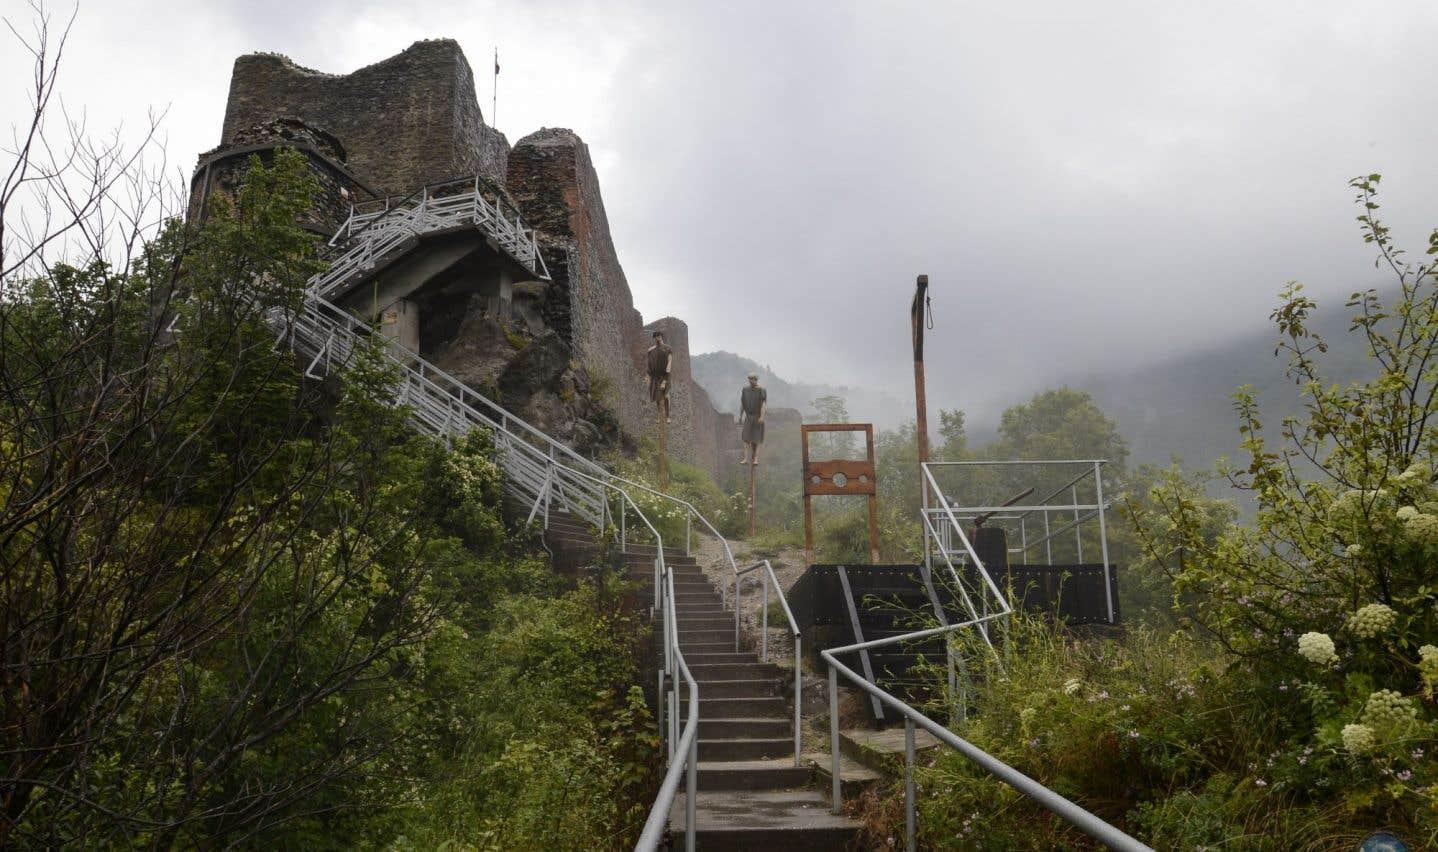 La forteresse roumaine de Dracula à Poenari